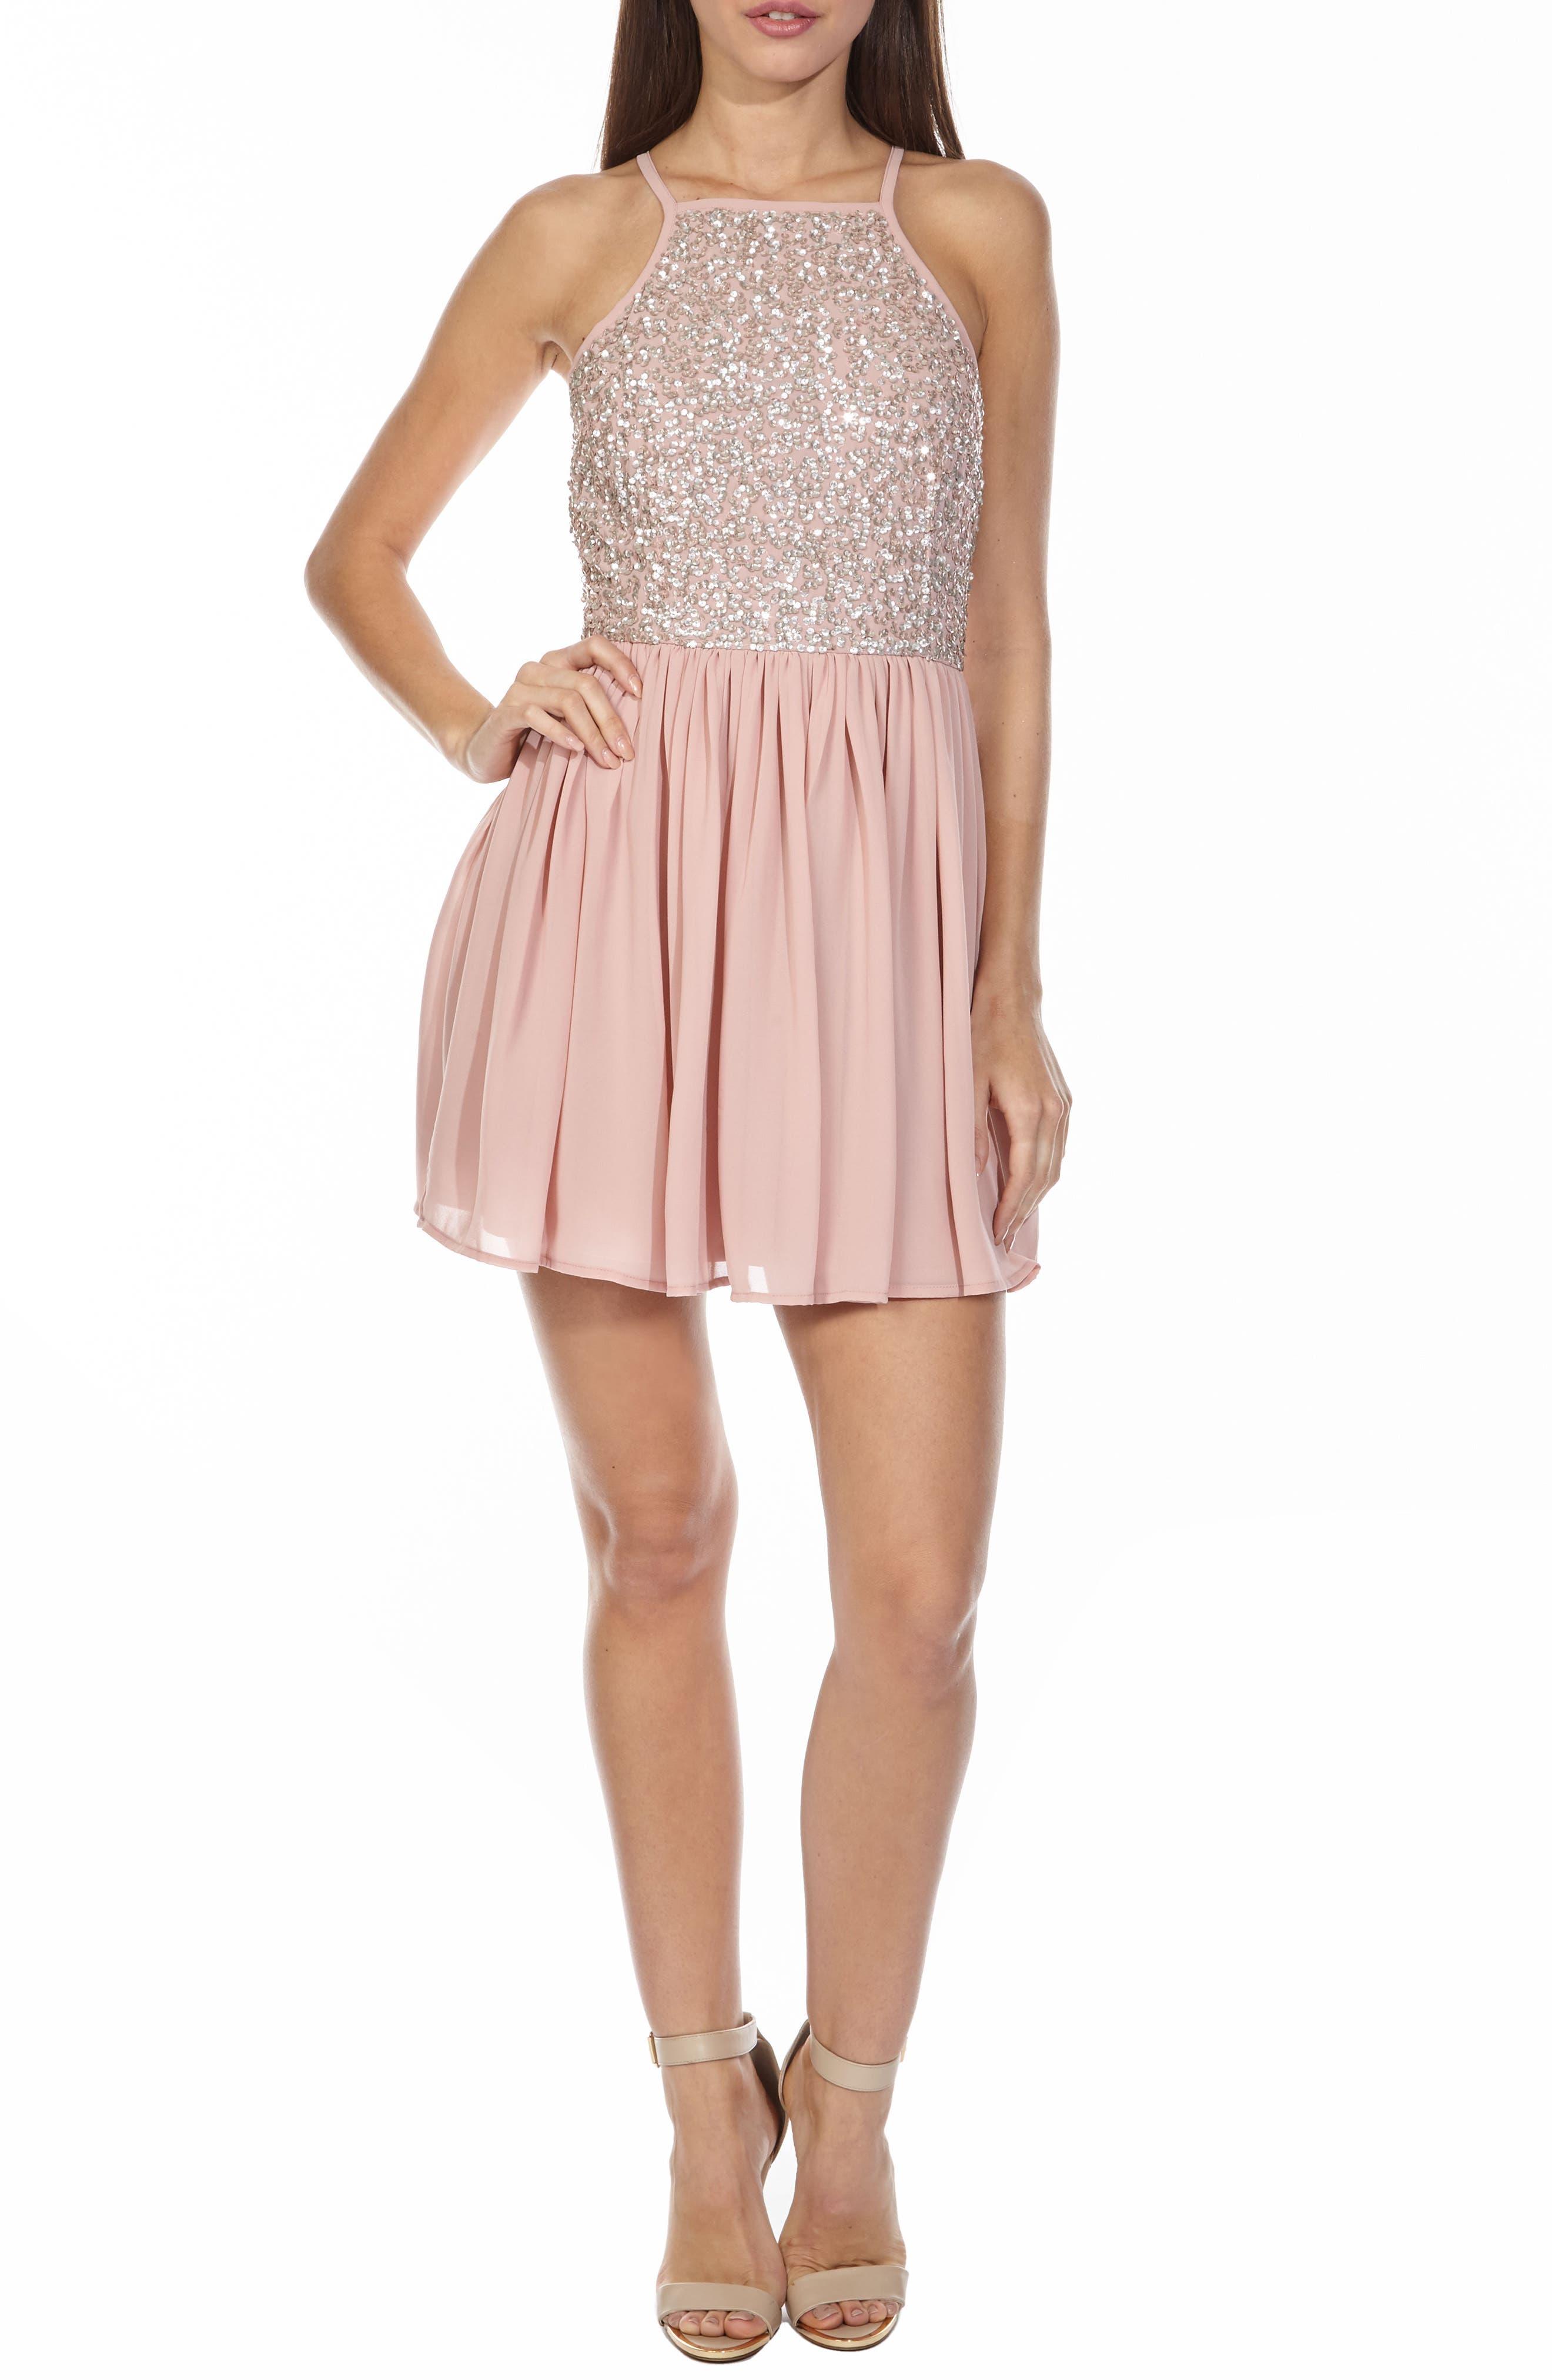 Alternate Image 1 Selected - Lace & Beads Sprinkle Sequin Skater Dress